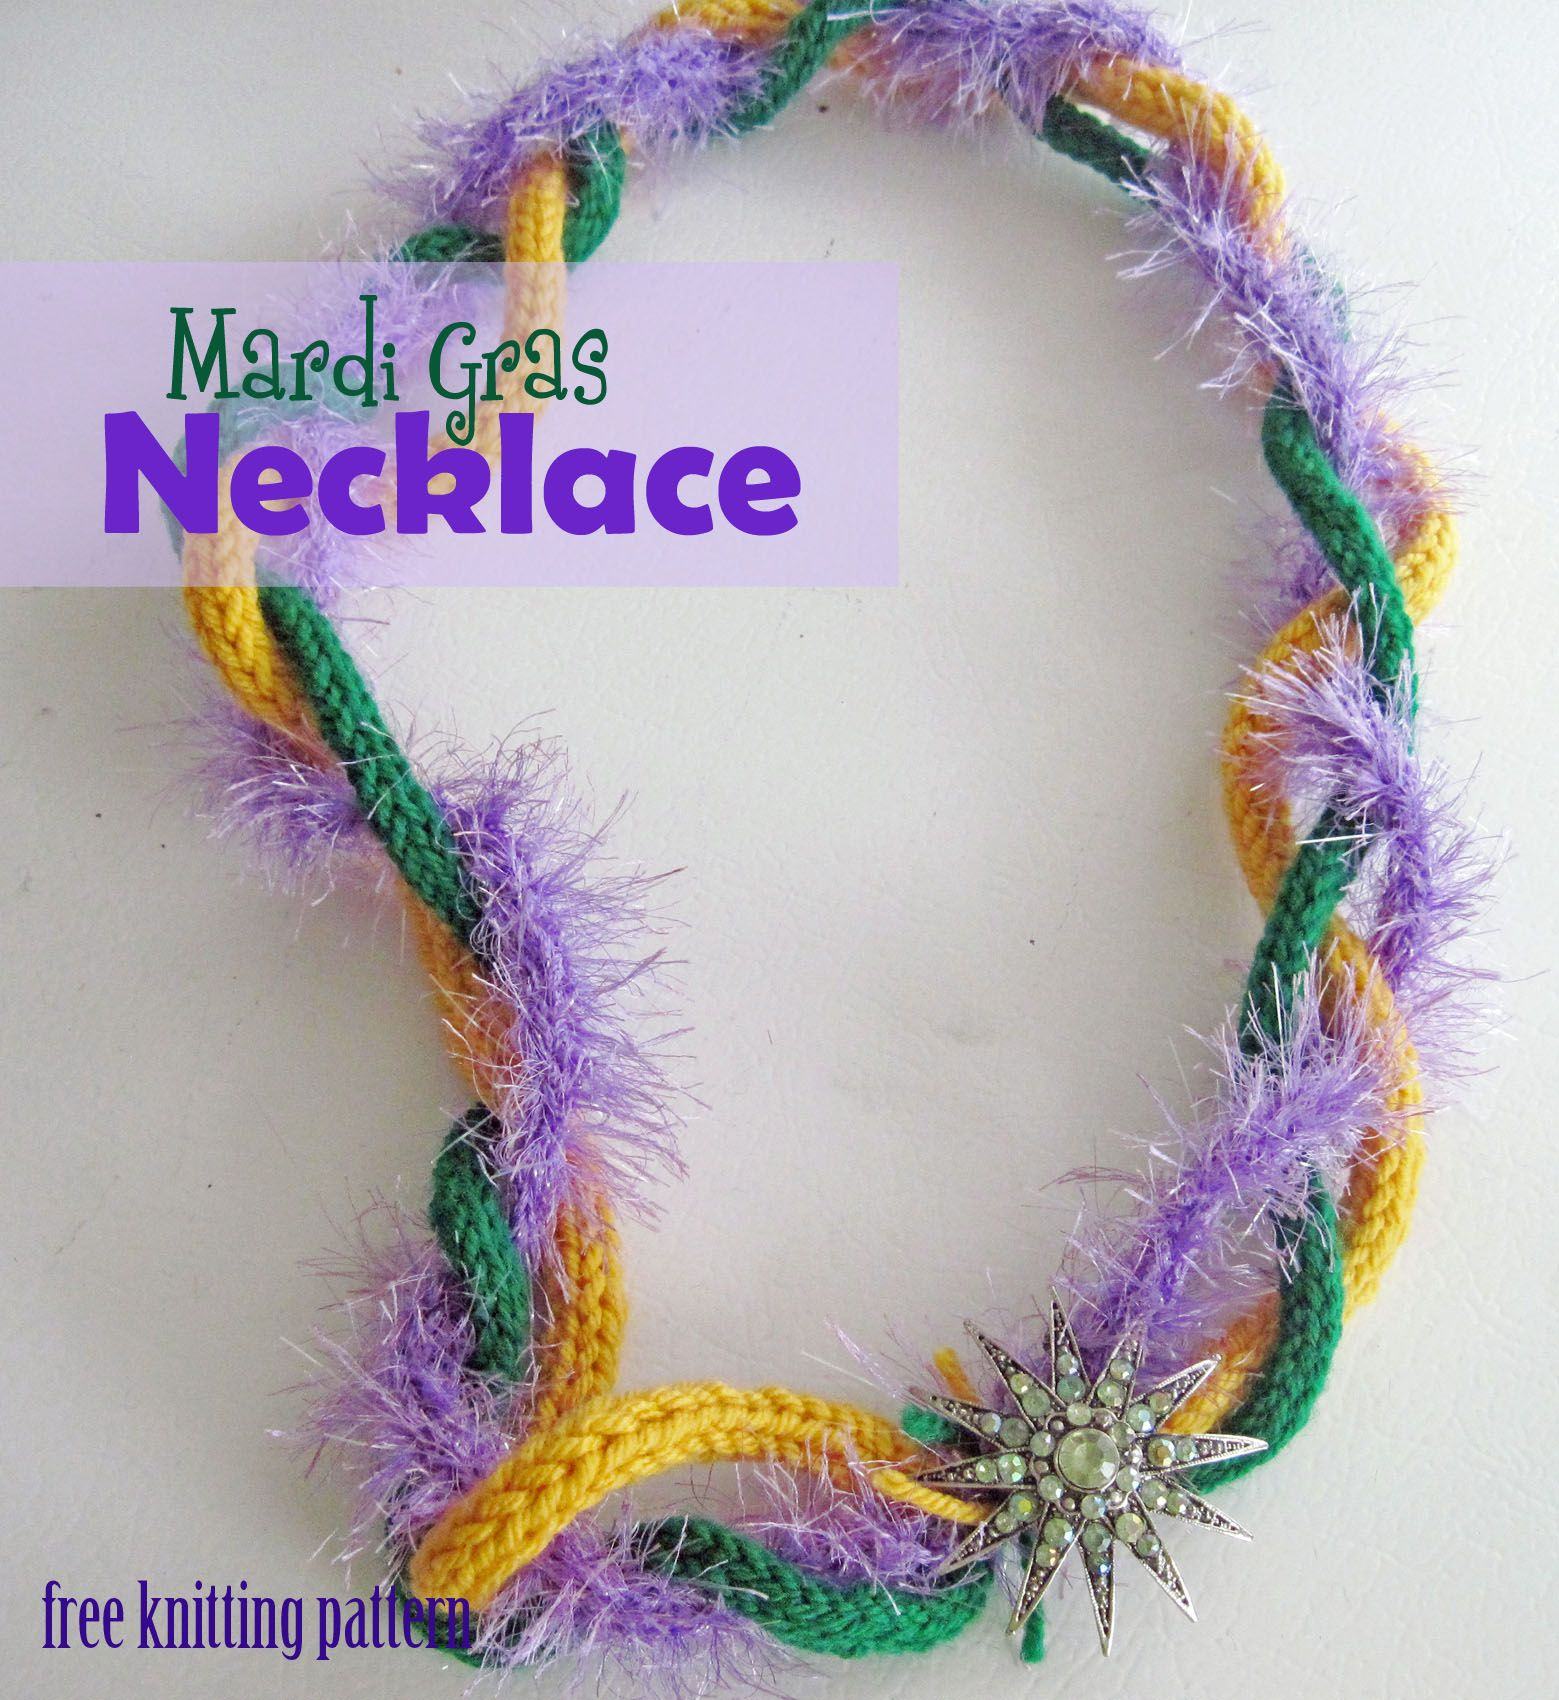 Free knitting pattern mardi gras necklace crochetknit jewelry free knitting pattern mardi gras necklace bankloansurffo Images